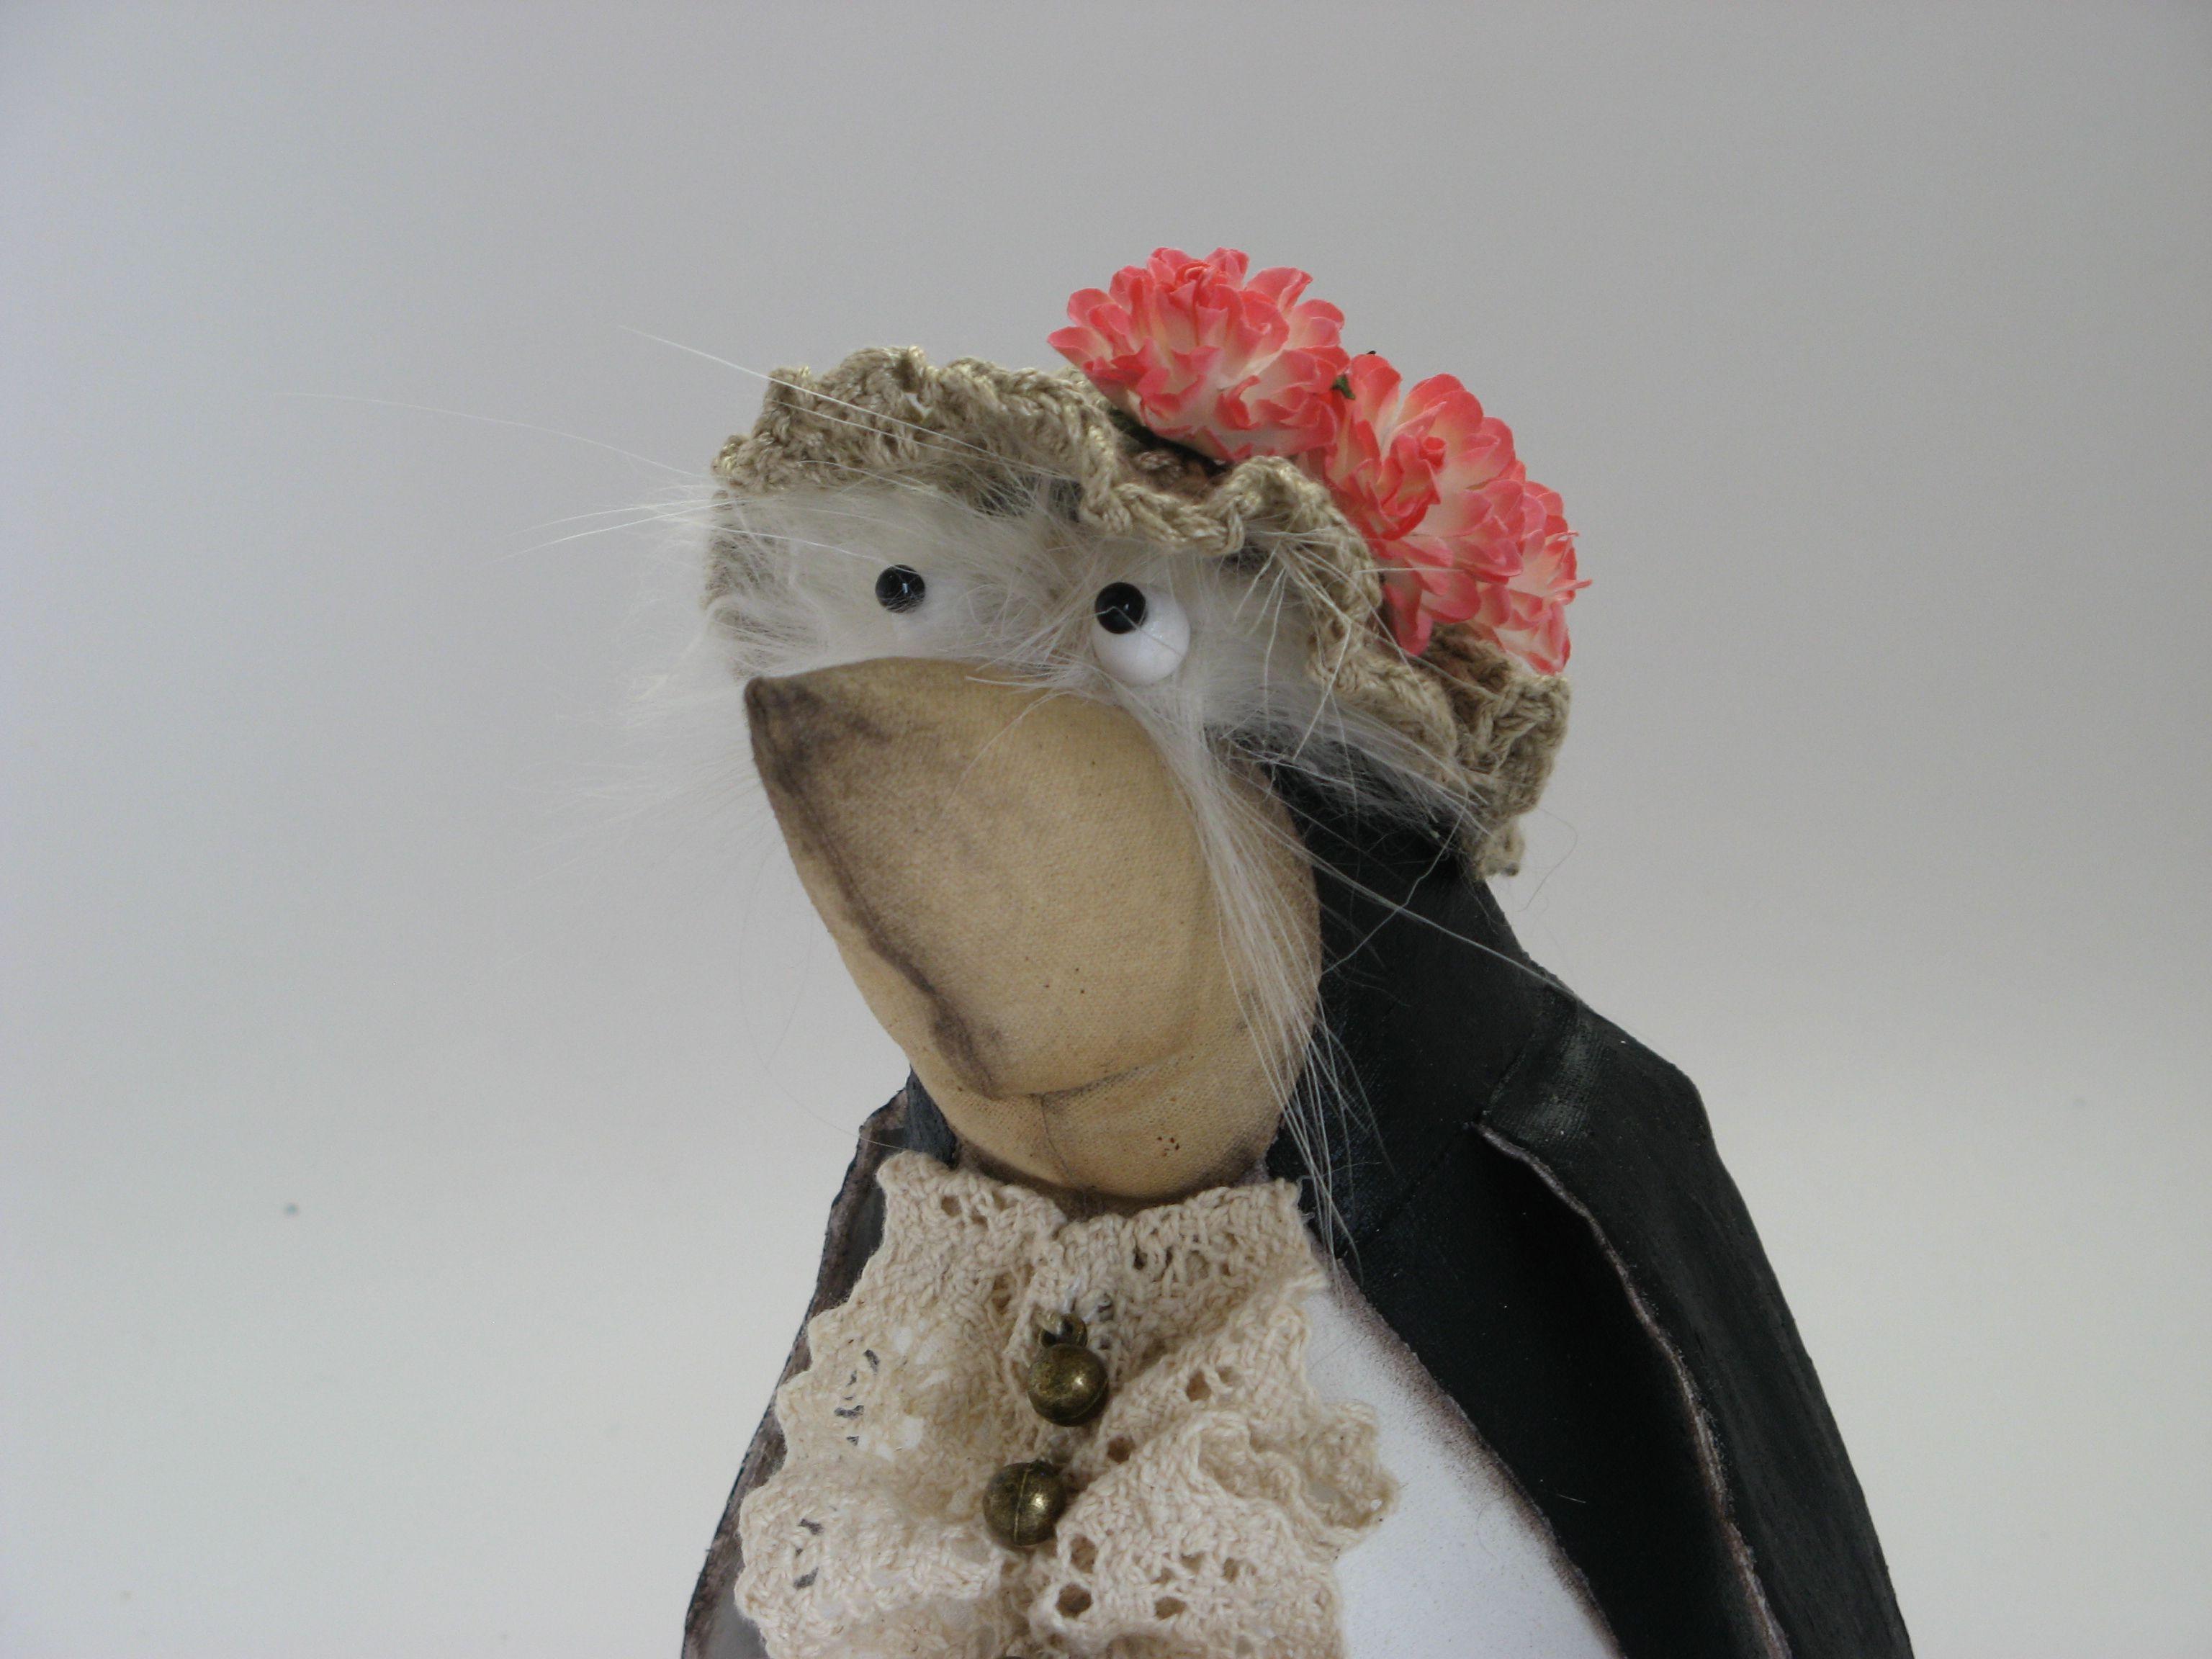 ручнойработышитыеигрушкиптицы пингвинтекстильныеигрушкикуклы